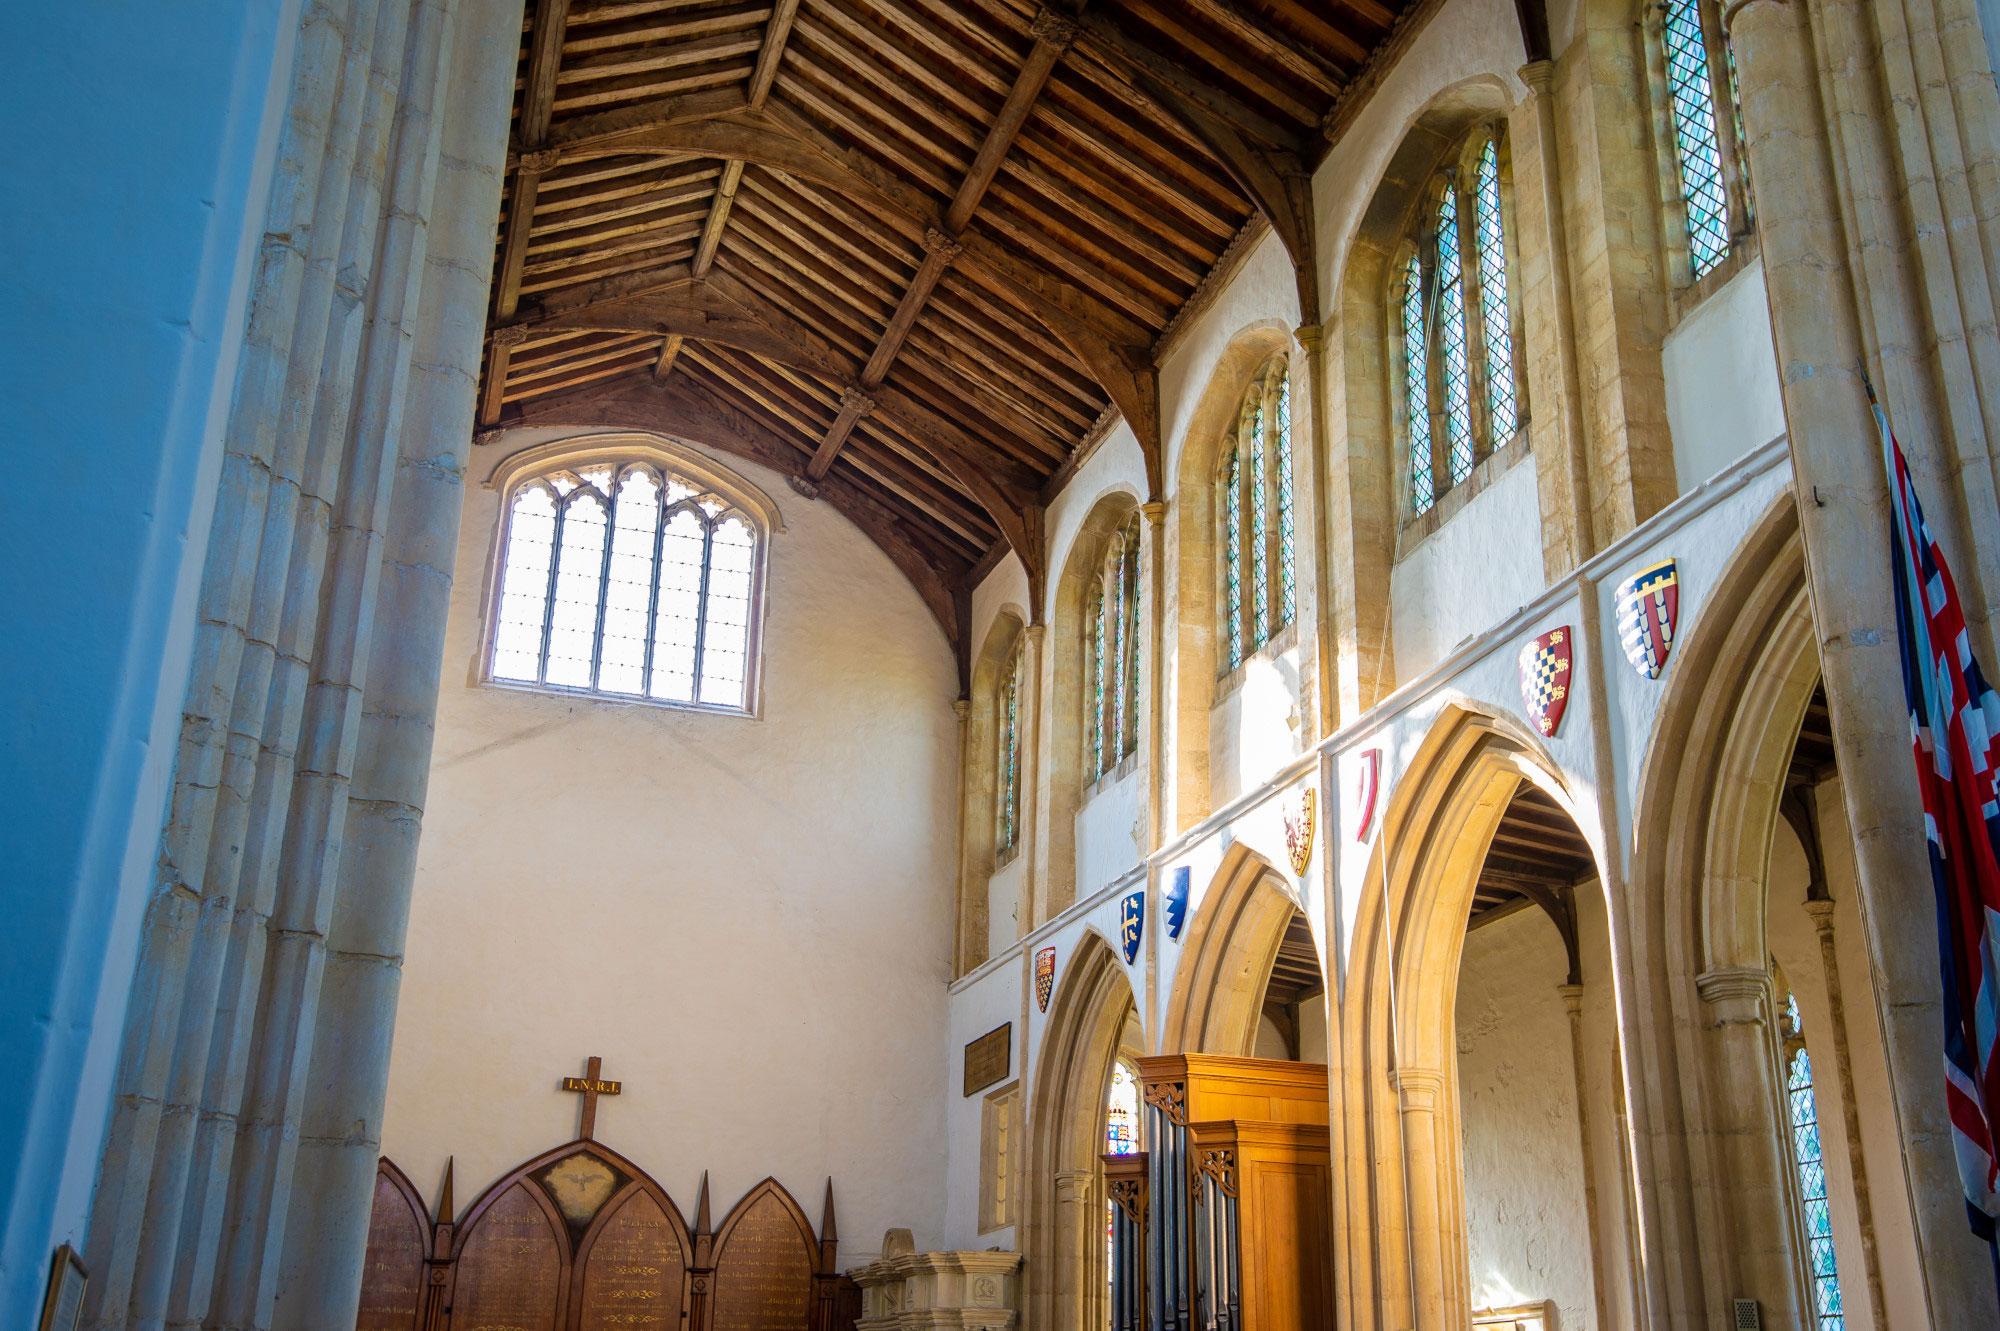 Forthinghay Church windows indoors 1